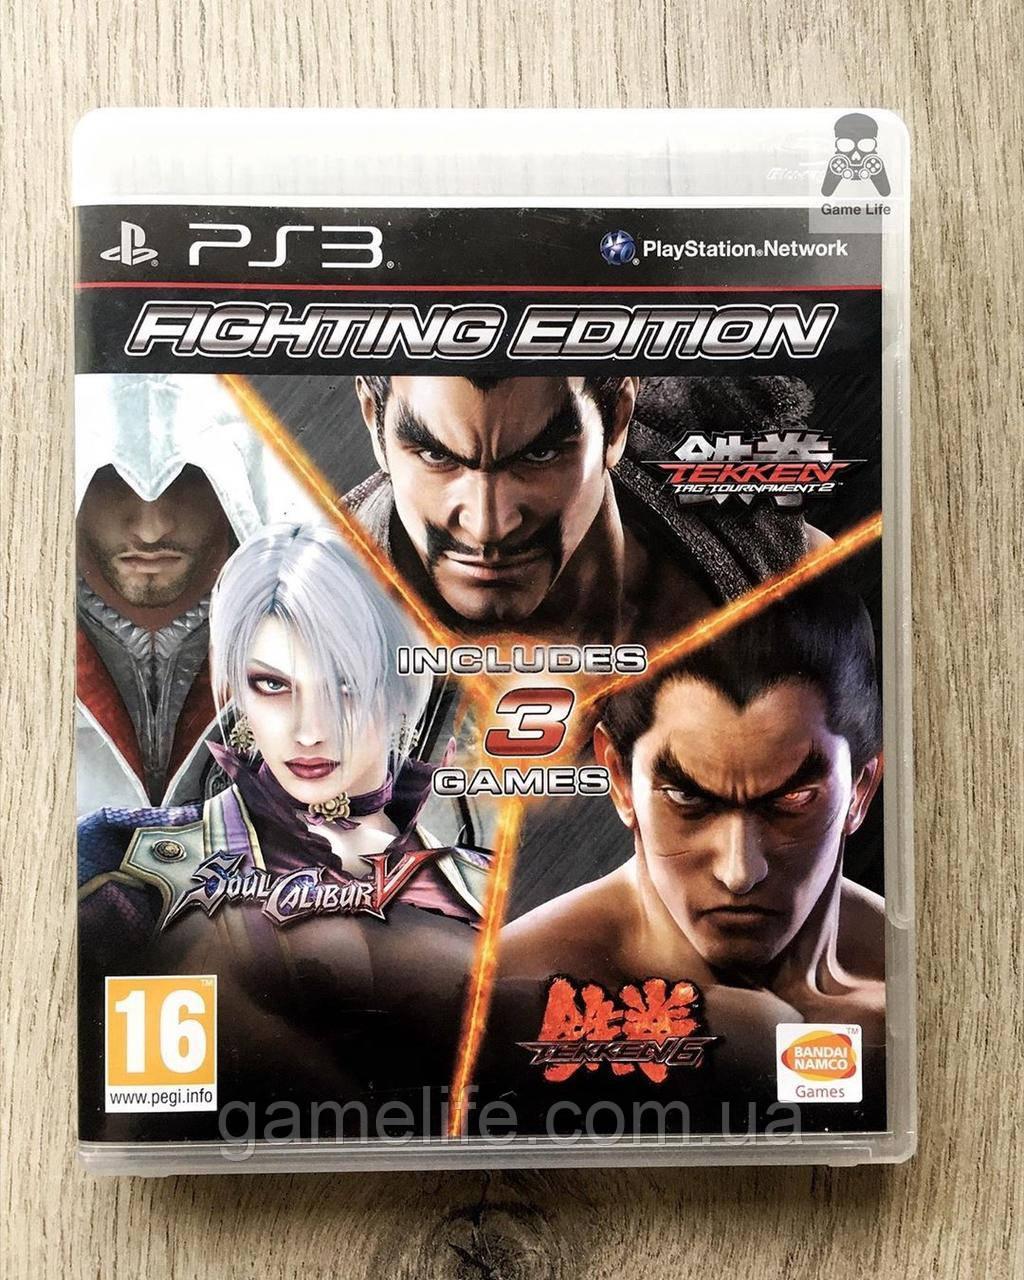 Fighting Edition (Tekken 6 Tag Tournament 2 Soul Calibur V) (англ.) (б/у) PS3